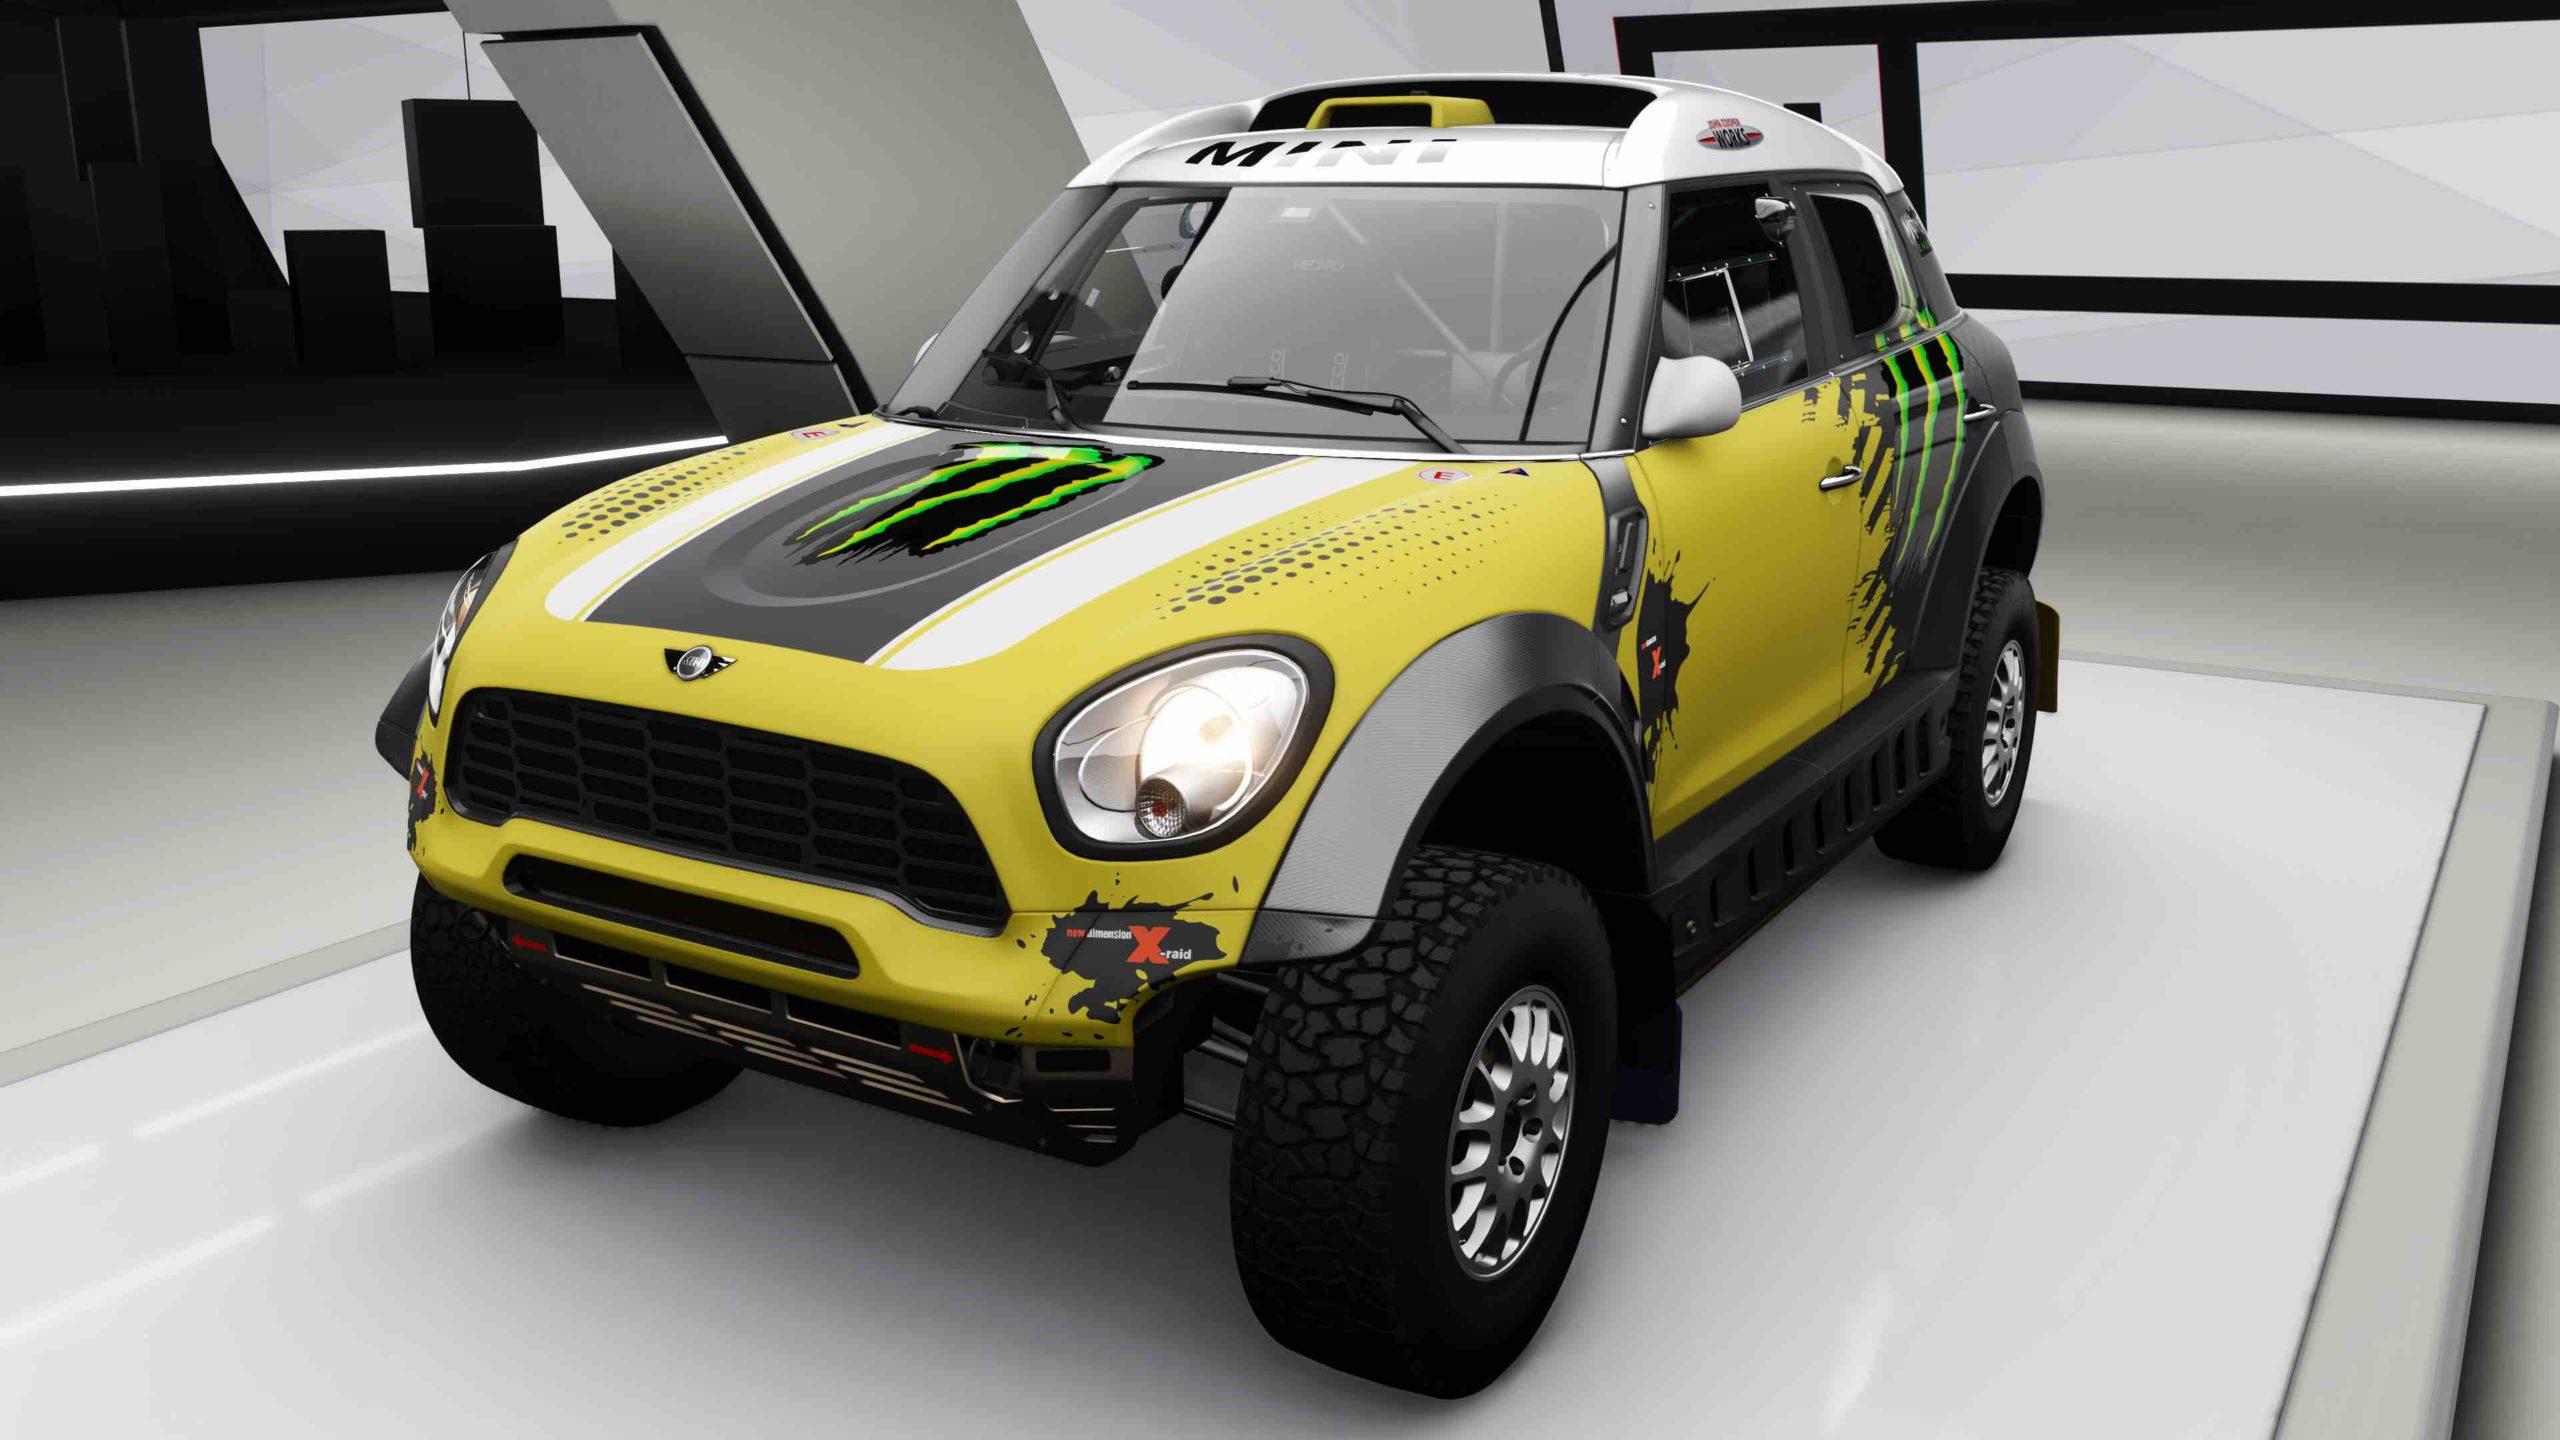 Forza-Horizon-4-Mini-X-Raid-All4-Racing-Countryman